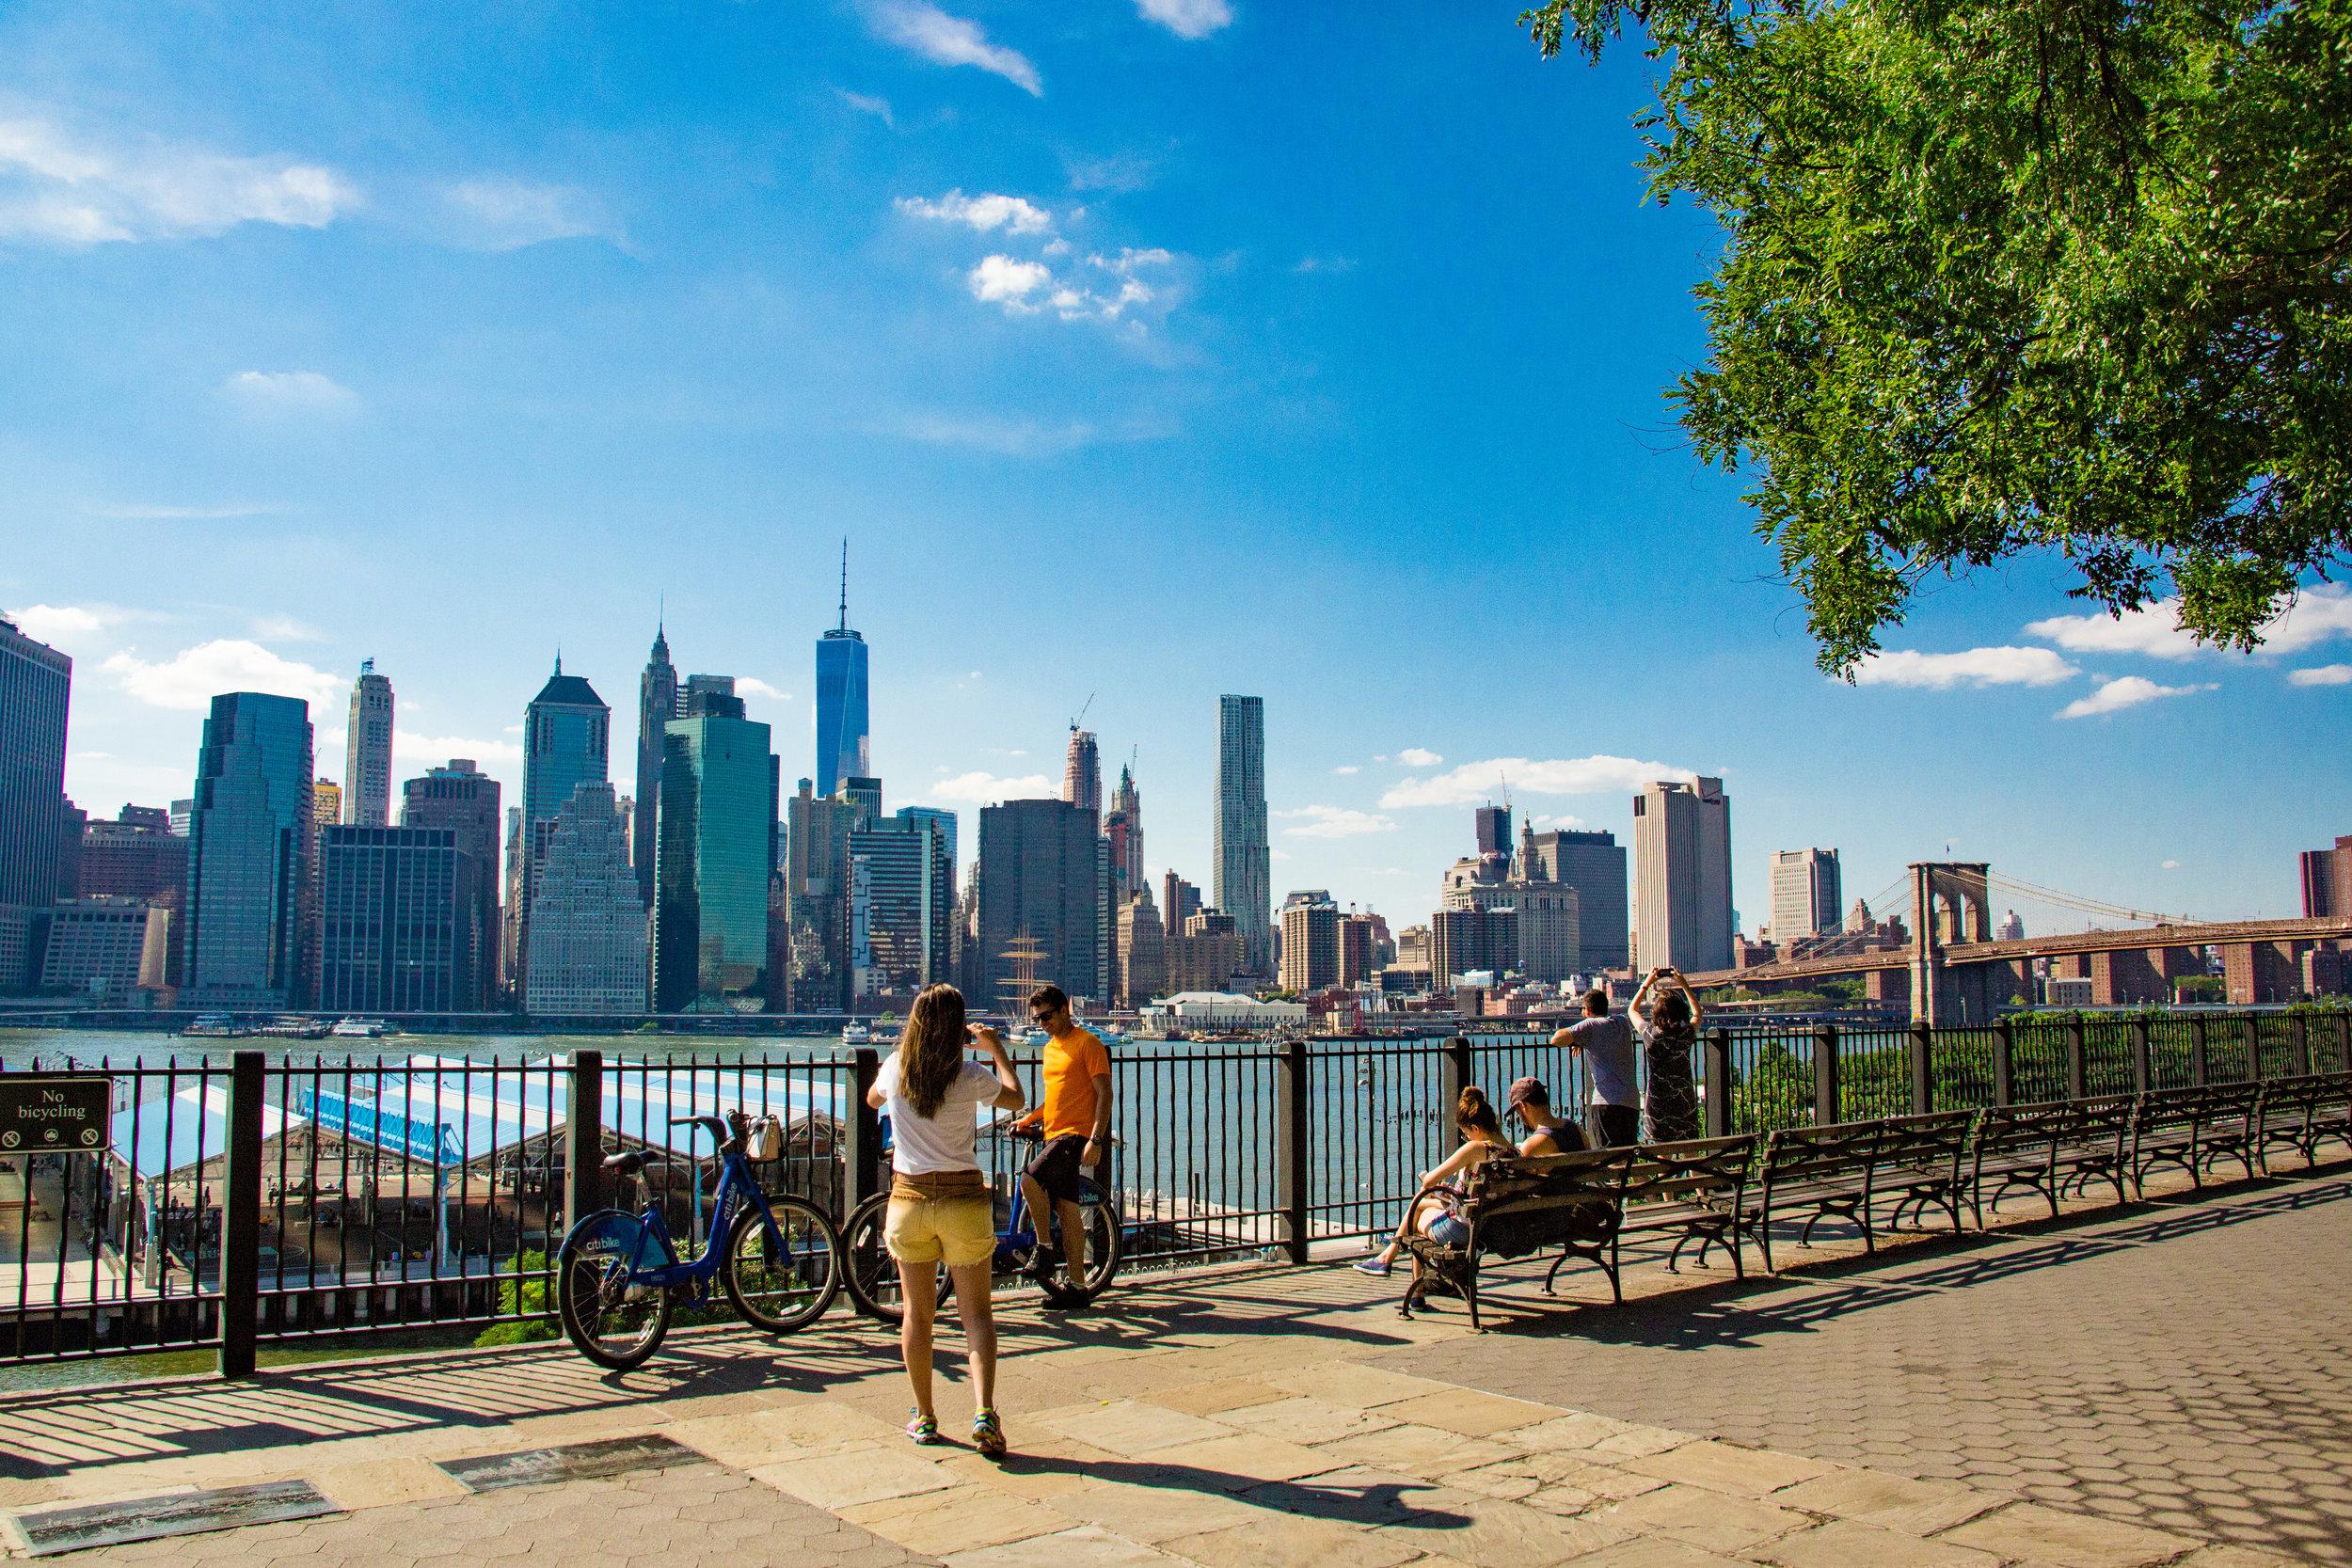 LSNY_Brooklyn_Bridge_Park-89.jpg